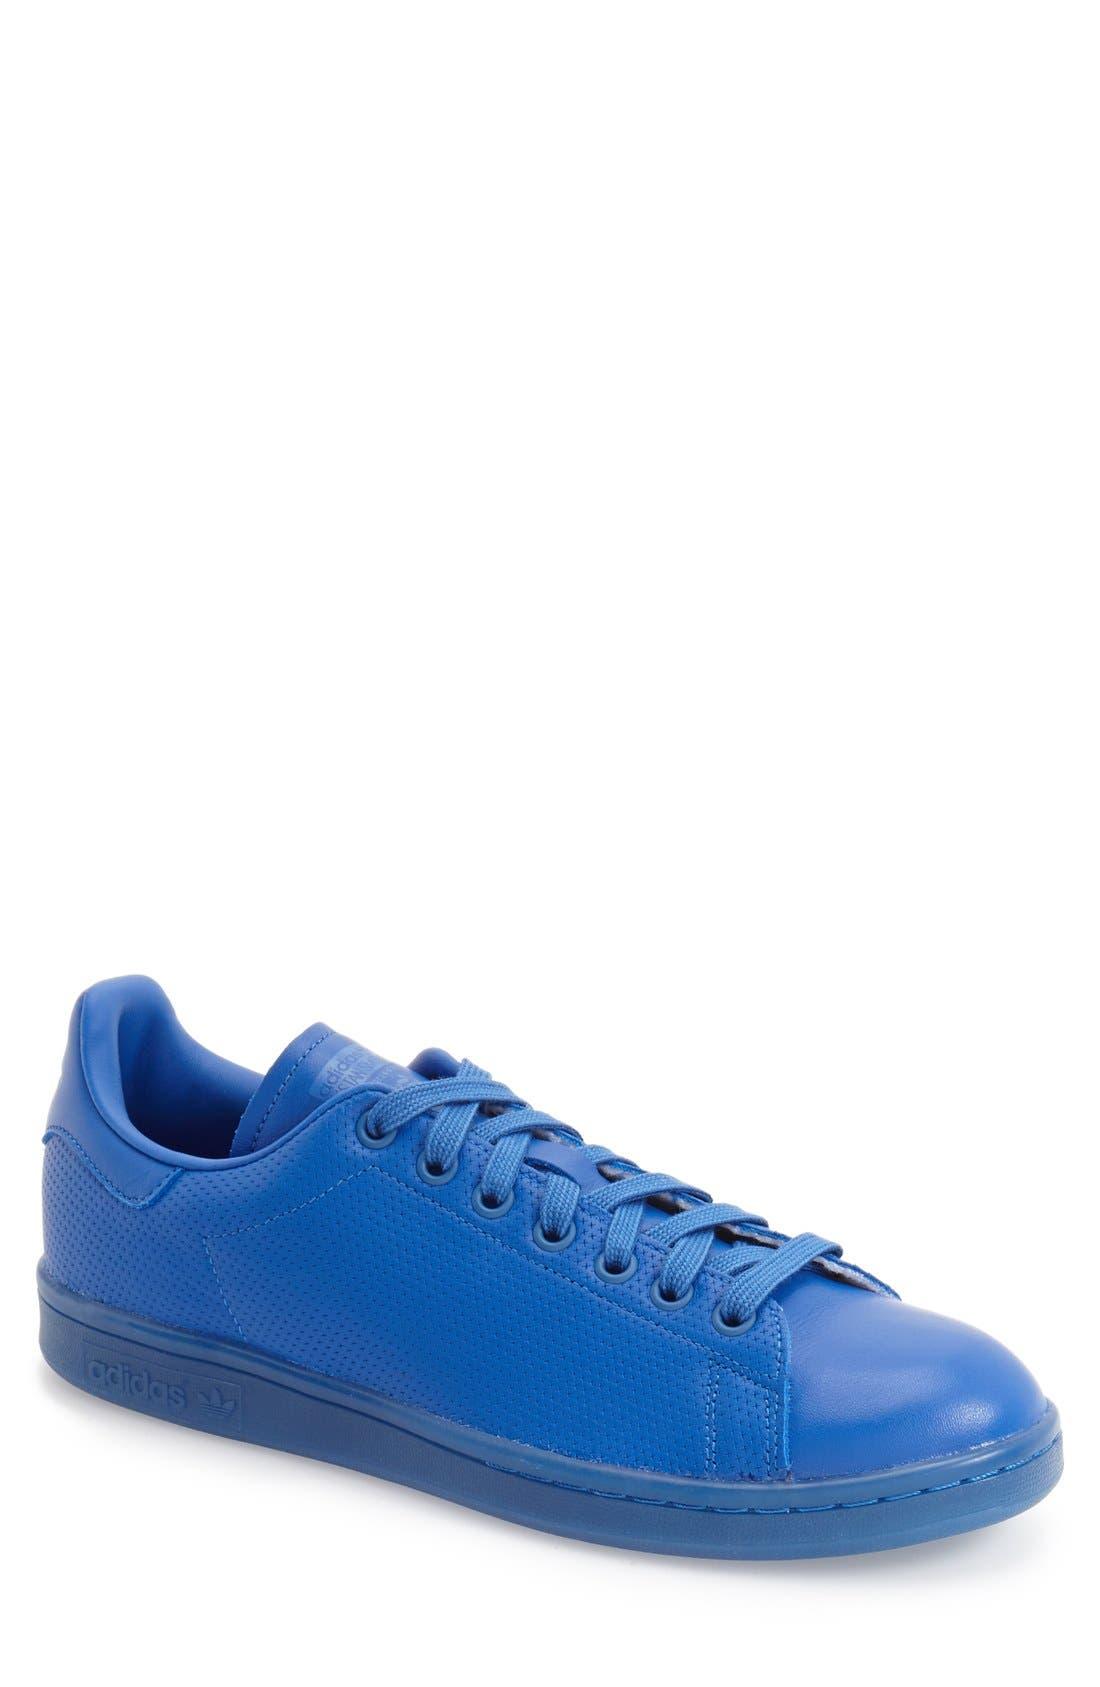 'Stan Smith' Sneaker, Main, color, 435